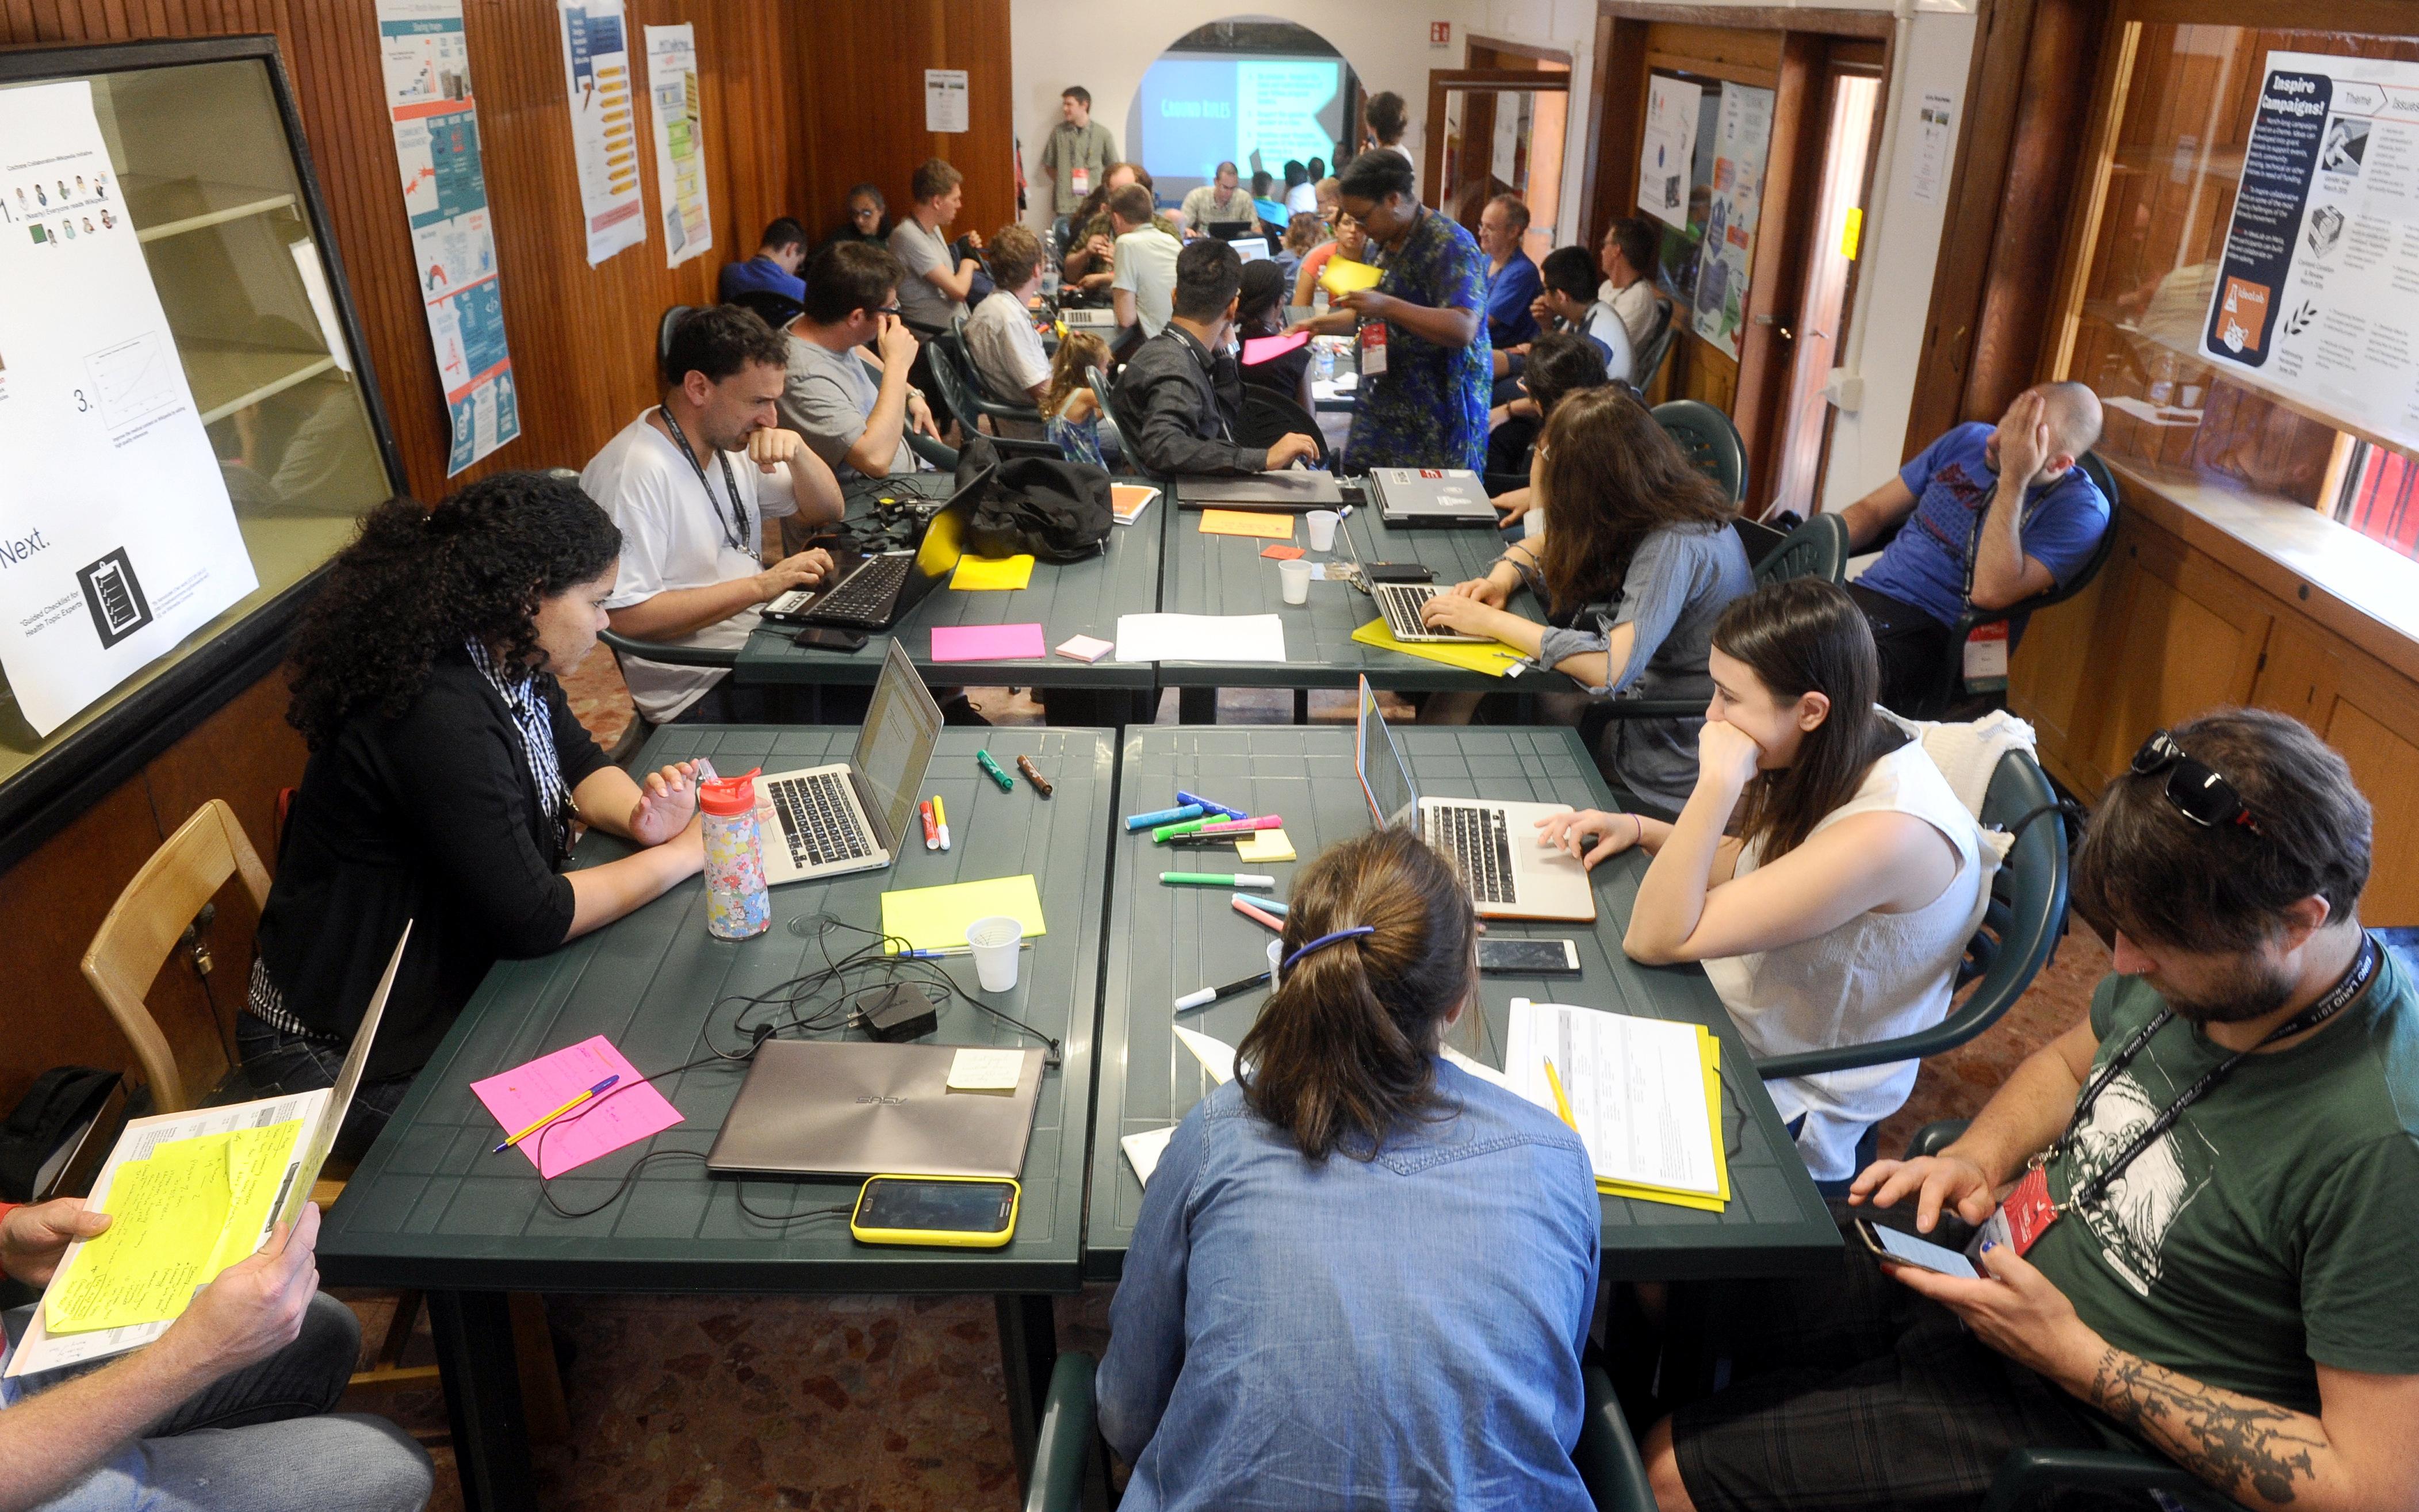 Wikimania_2016_-_IdeaLab_Workshop_02